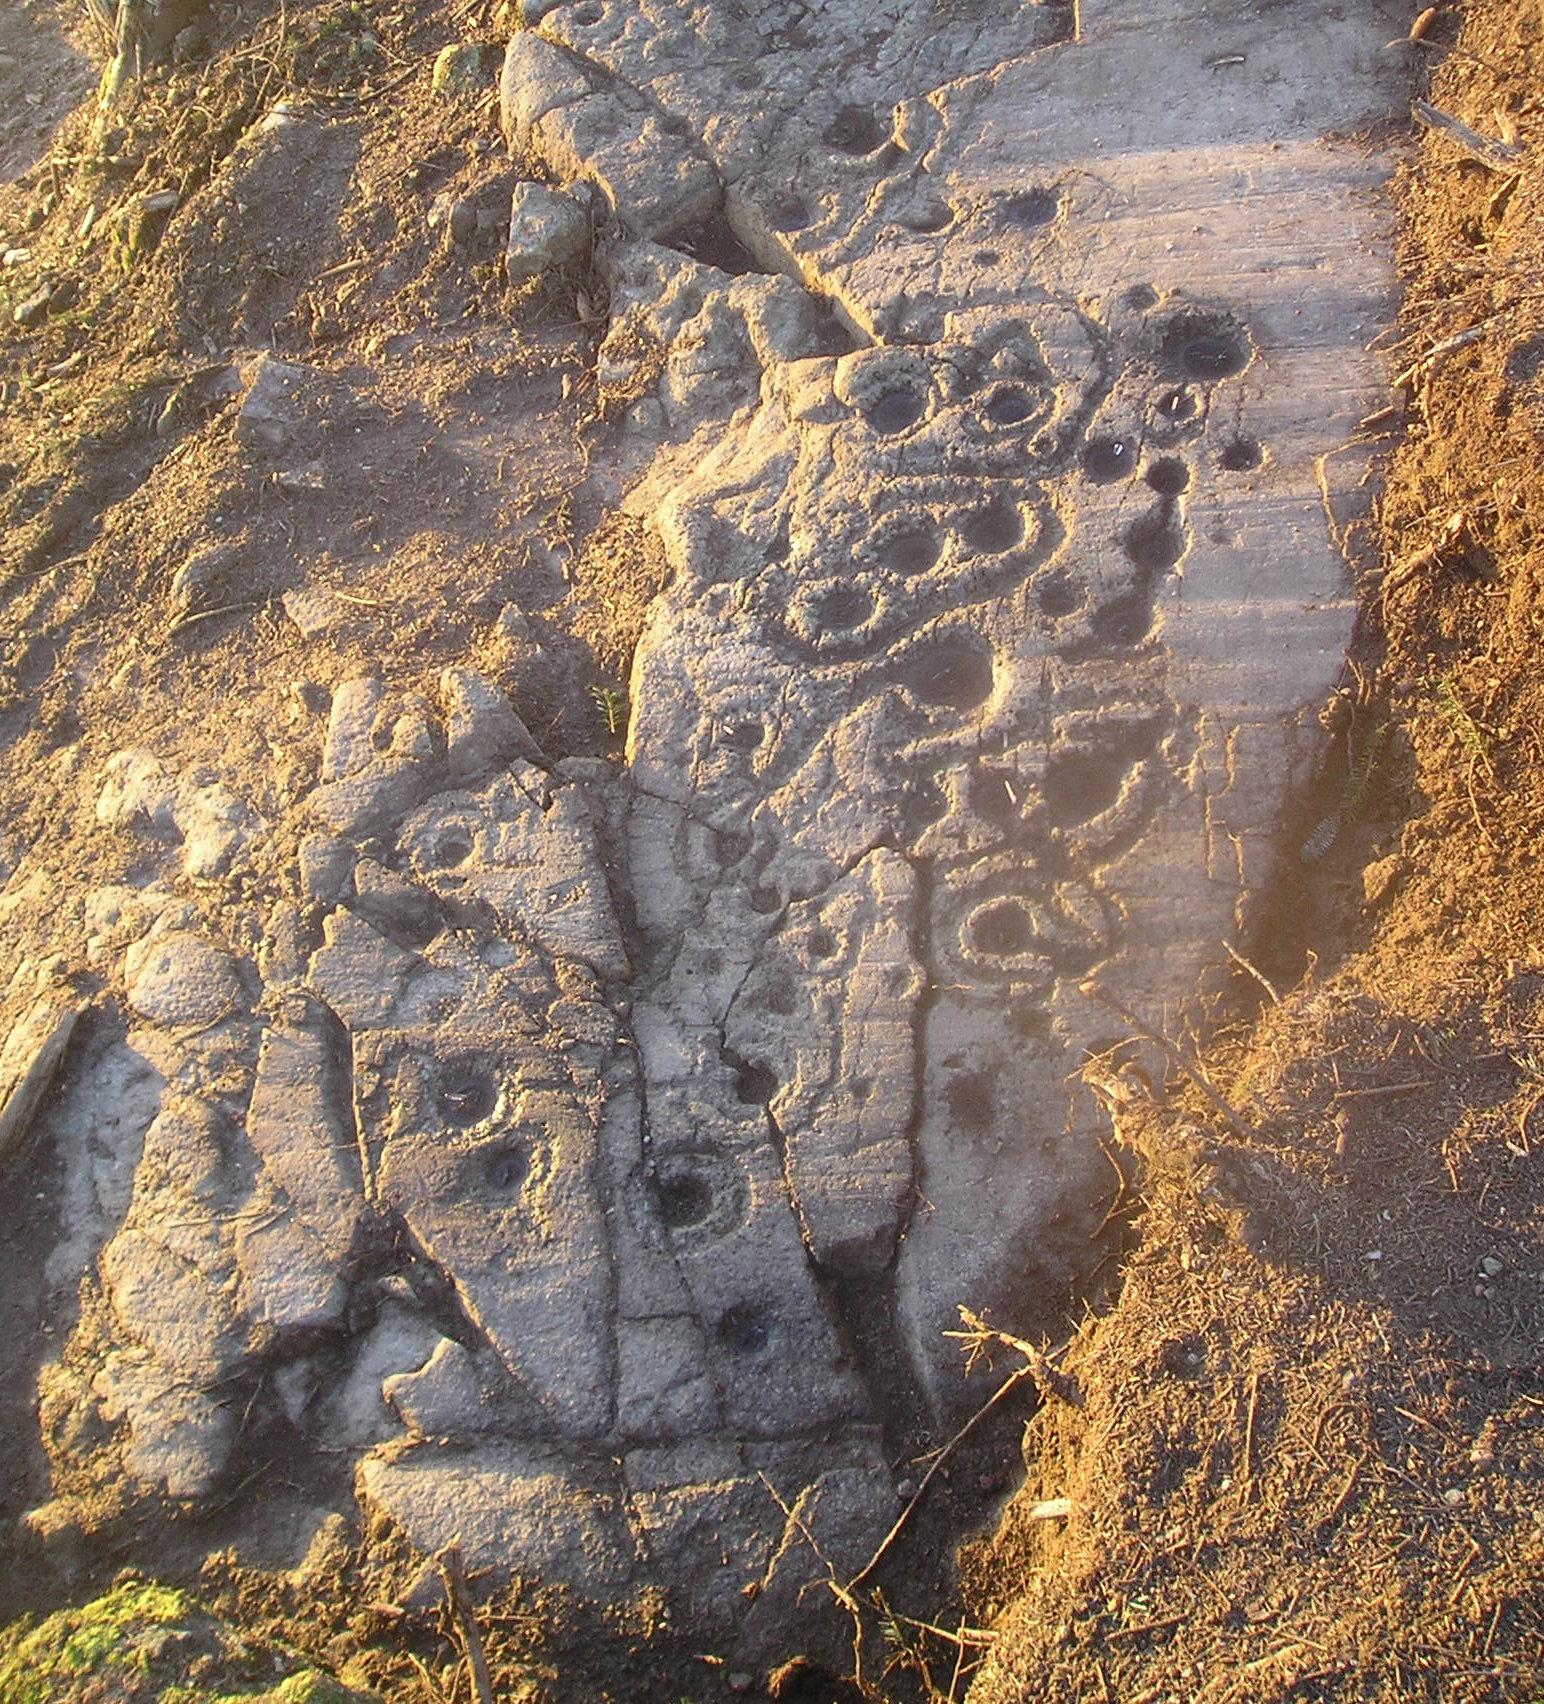 Discovered in Lurgan, near Aberfeldy